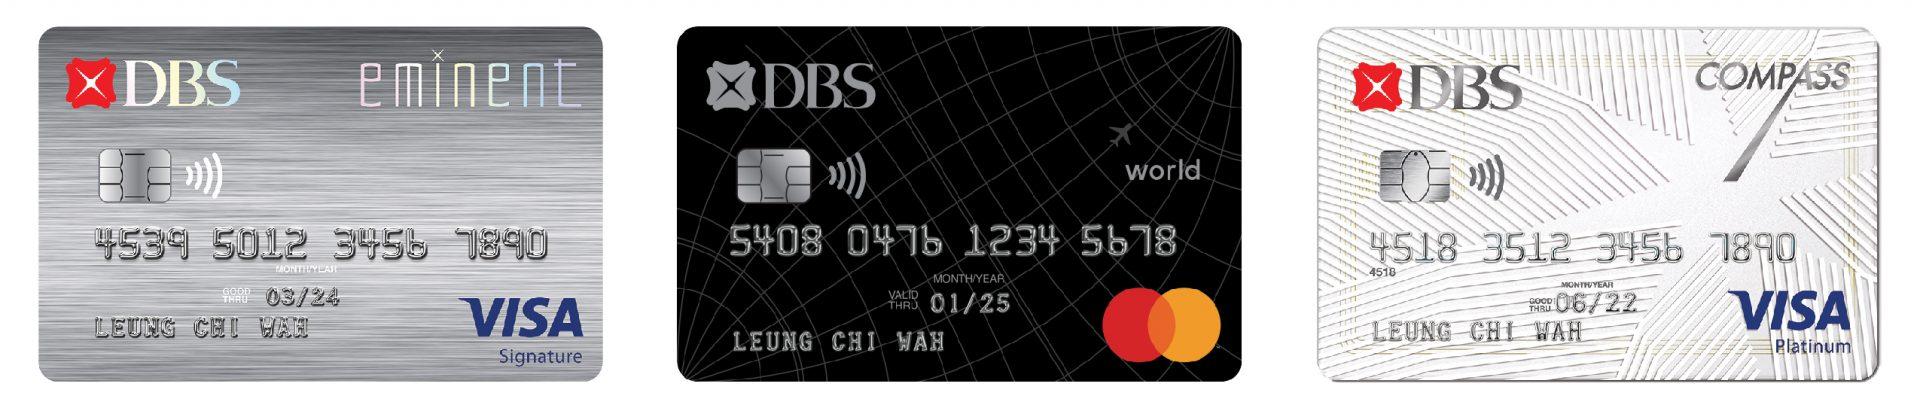 DBS Card Face